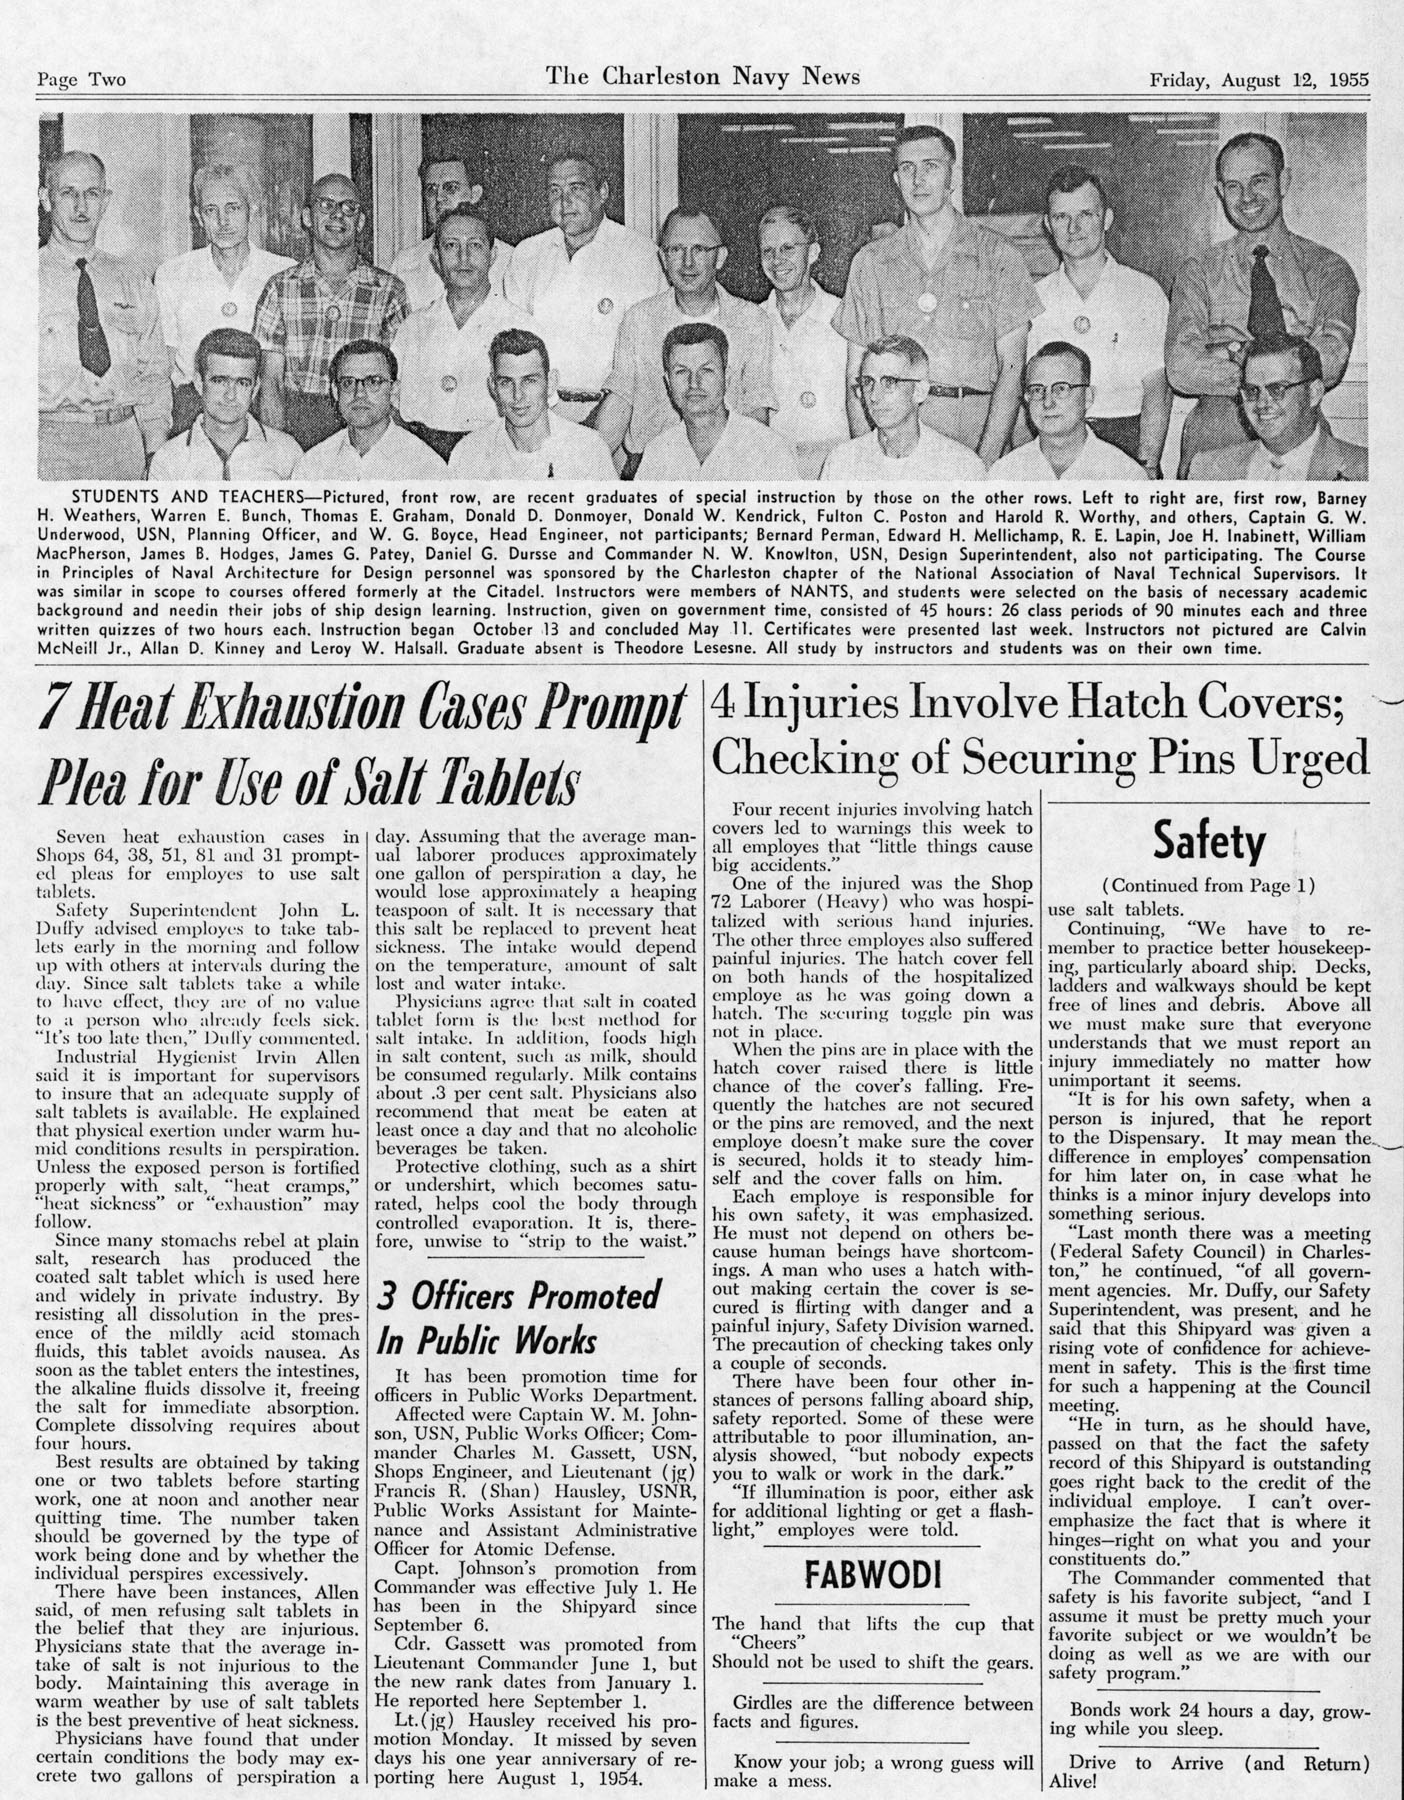 The Charleston Navy News, Volume 14, Edition 2, page ii